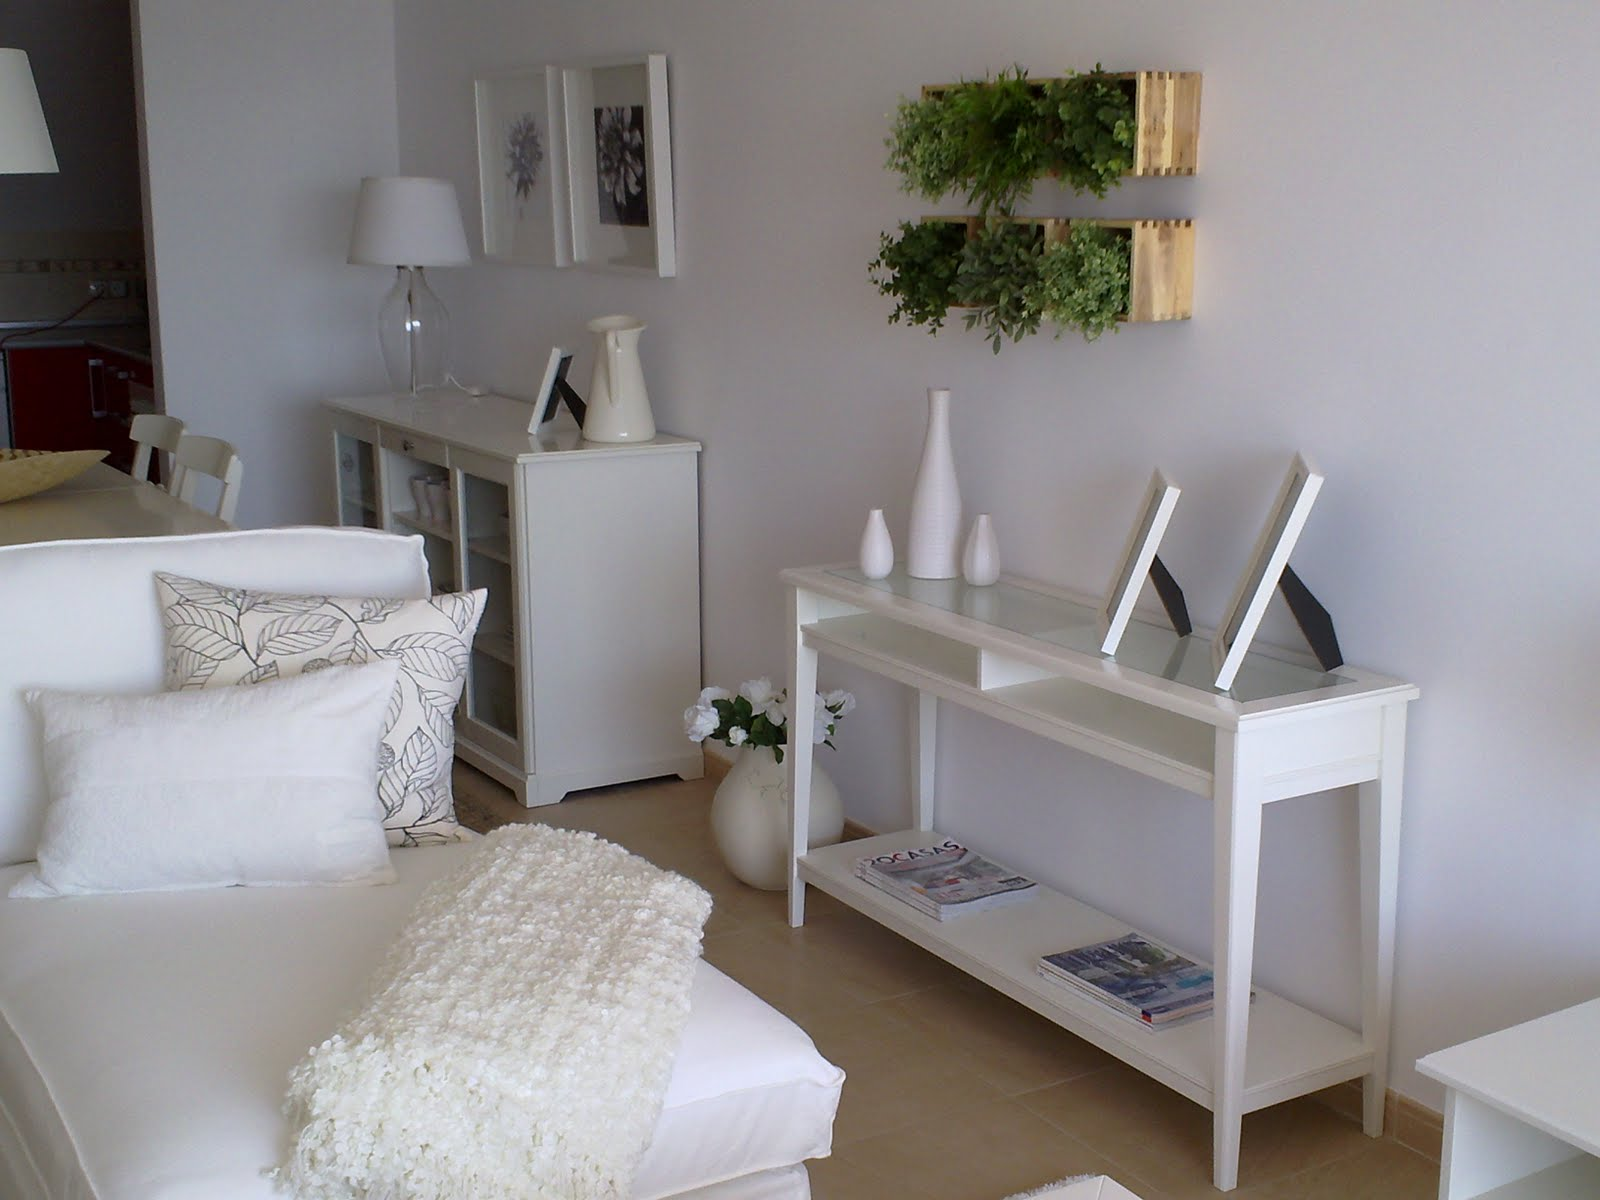 Lujo Casas Ikea Fotos Coleccin de Imgenes Ideas de Decoracin de